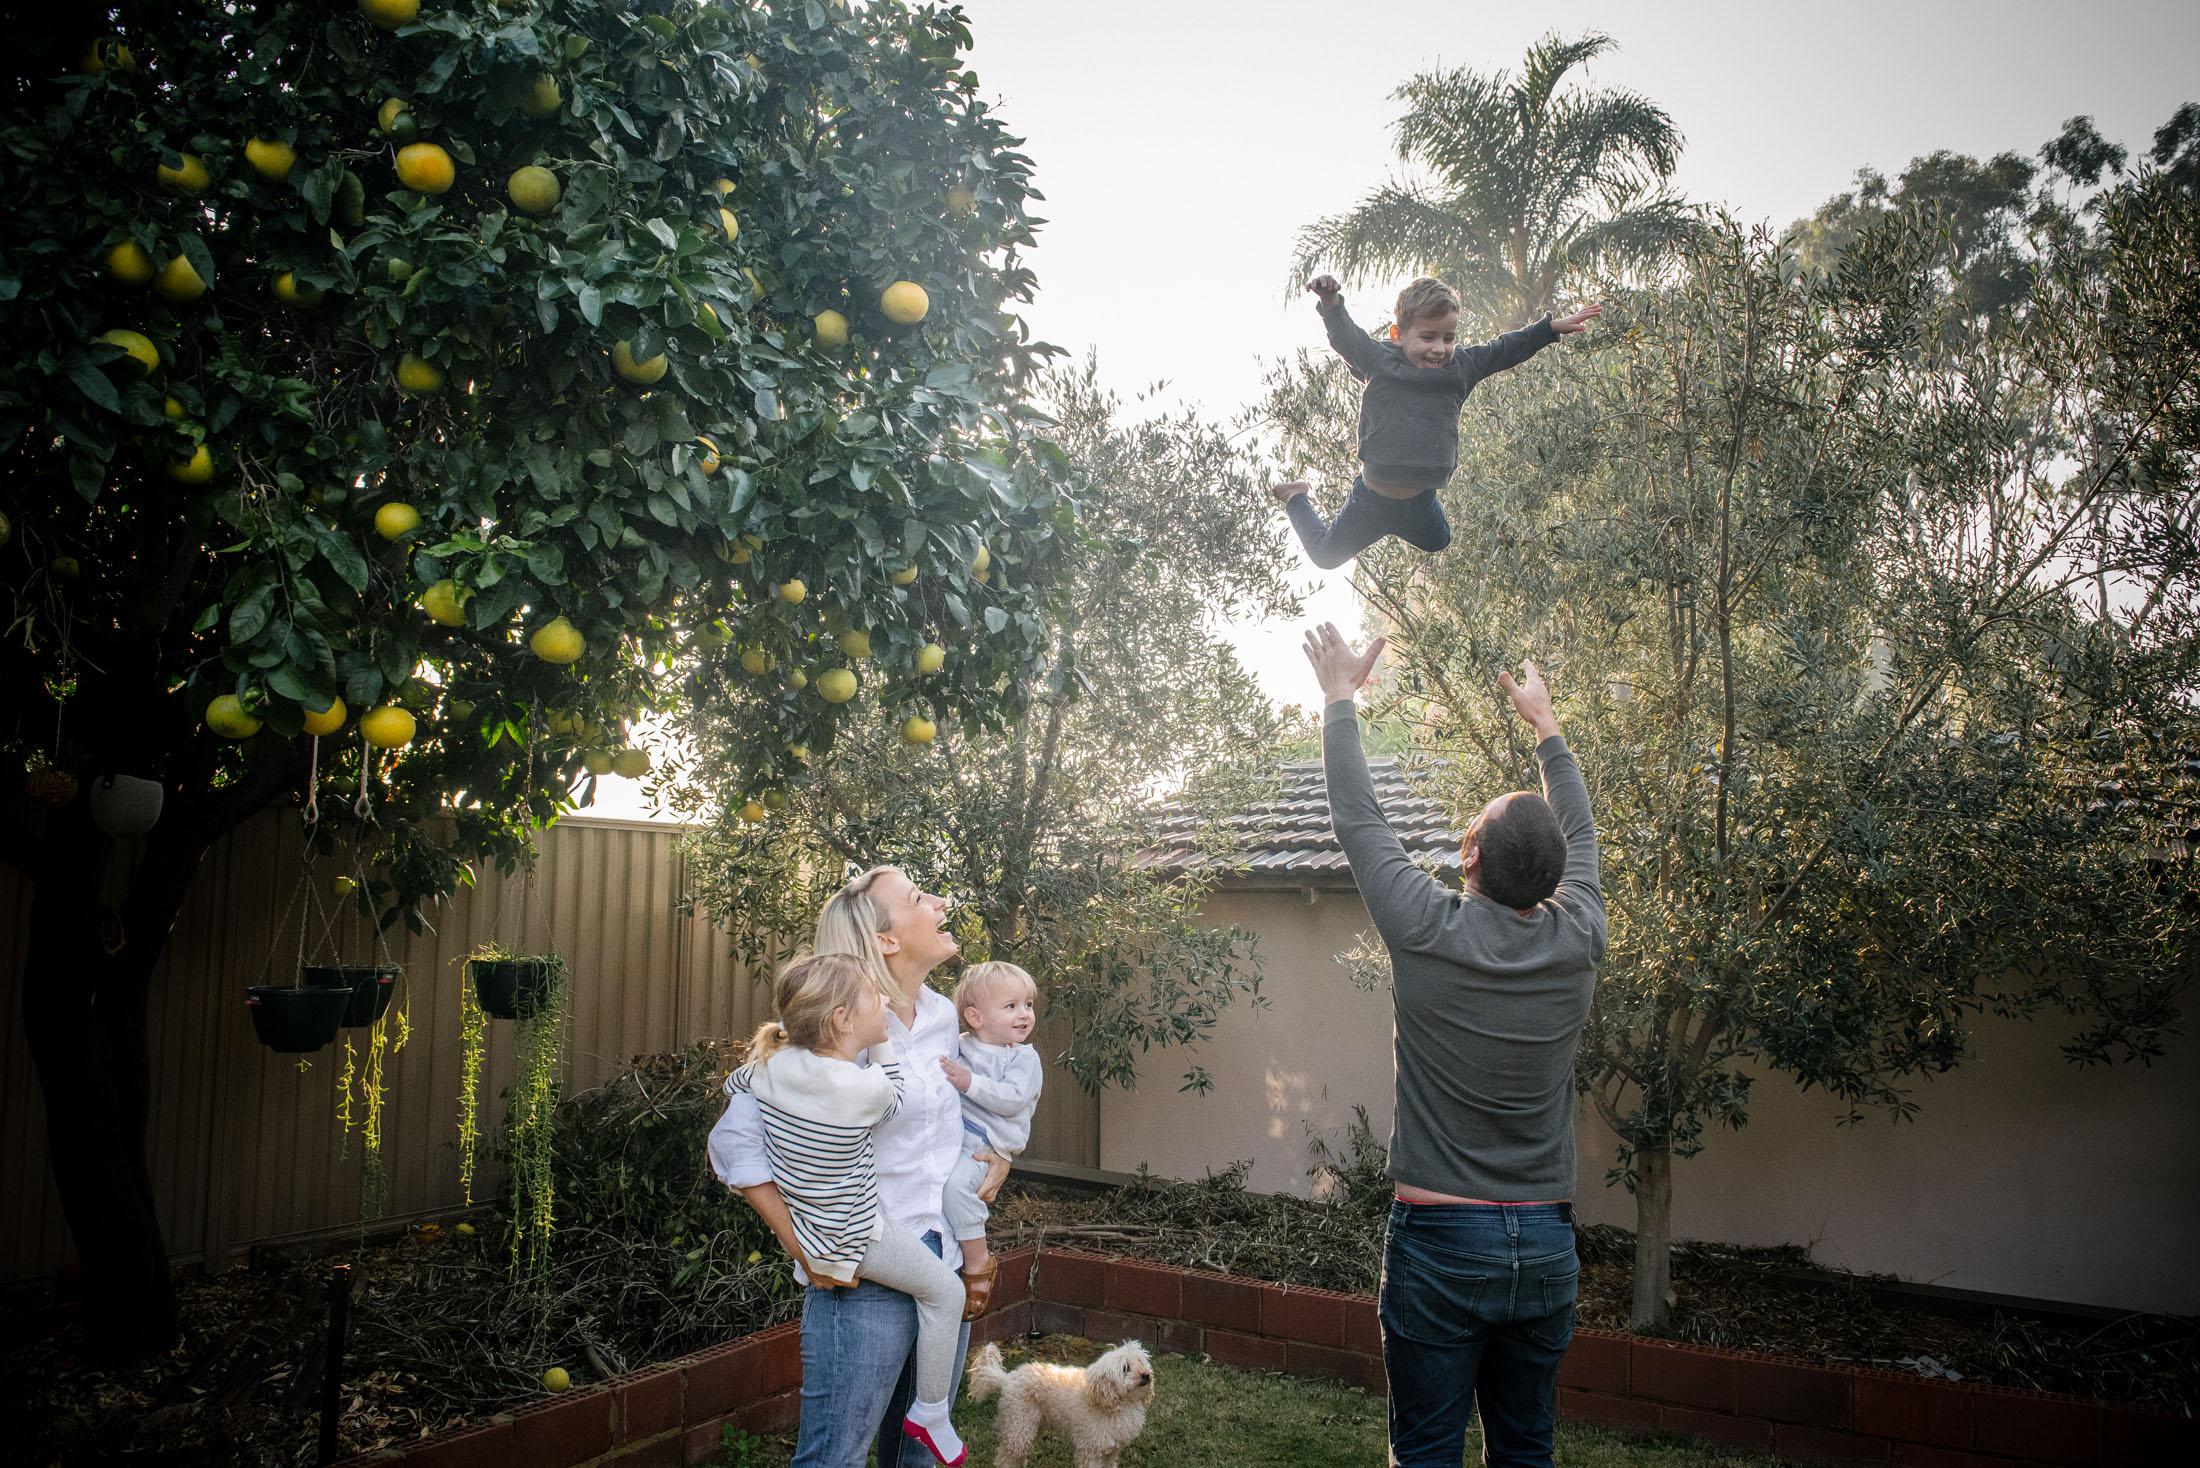 Laing_Family-Photography-unposed10.JPG